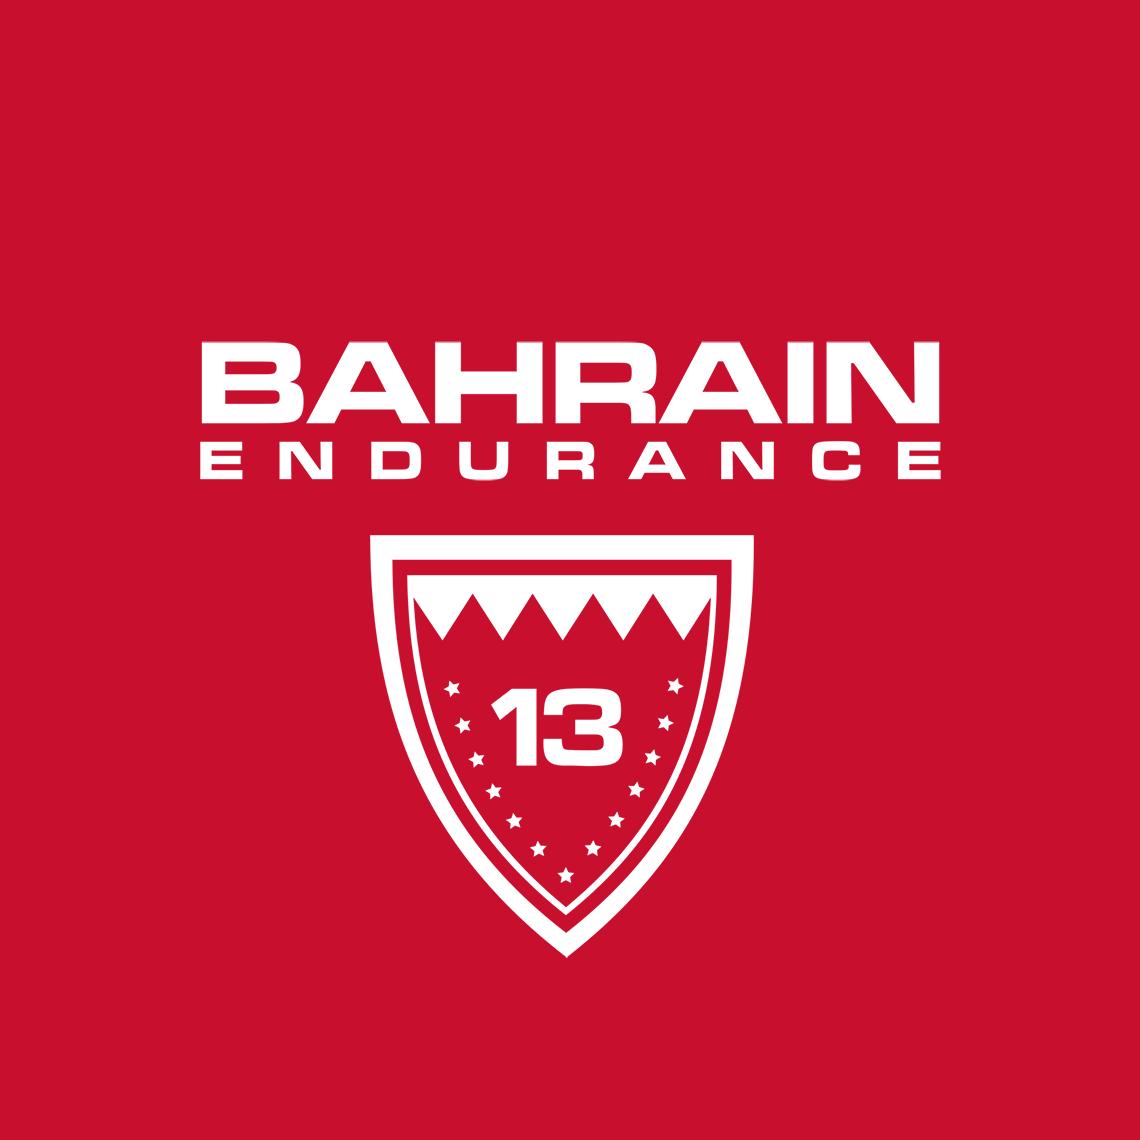 Open Letter from NGOs to Bahrain 13 Endurance Team